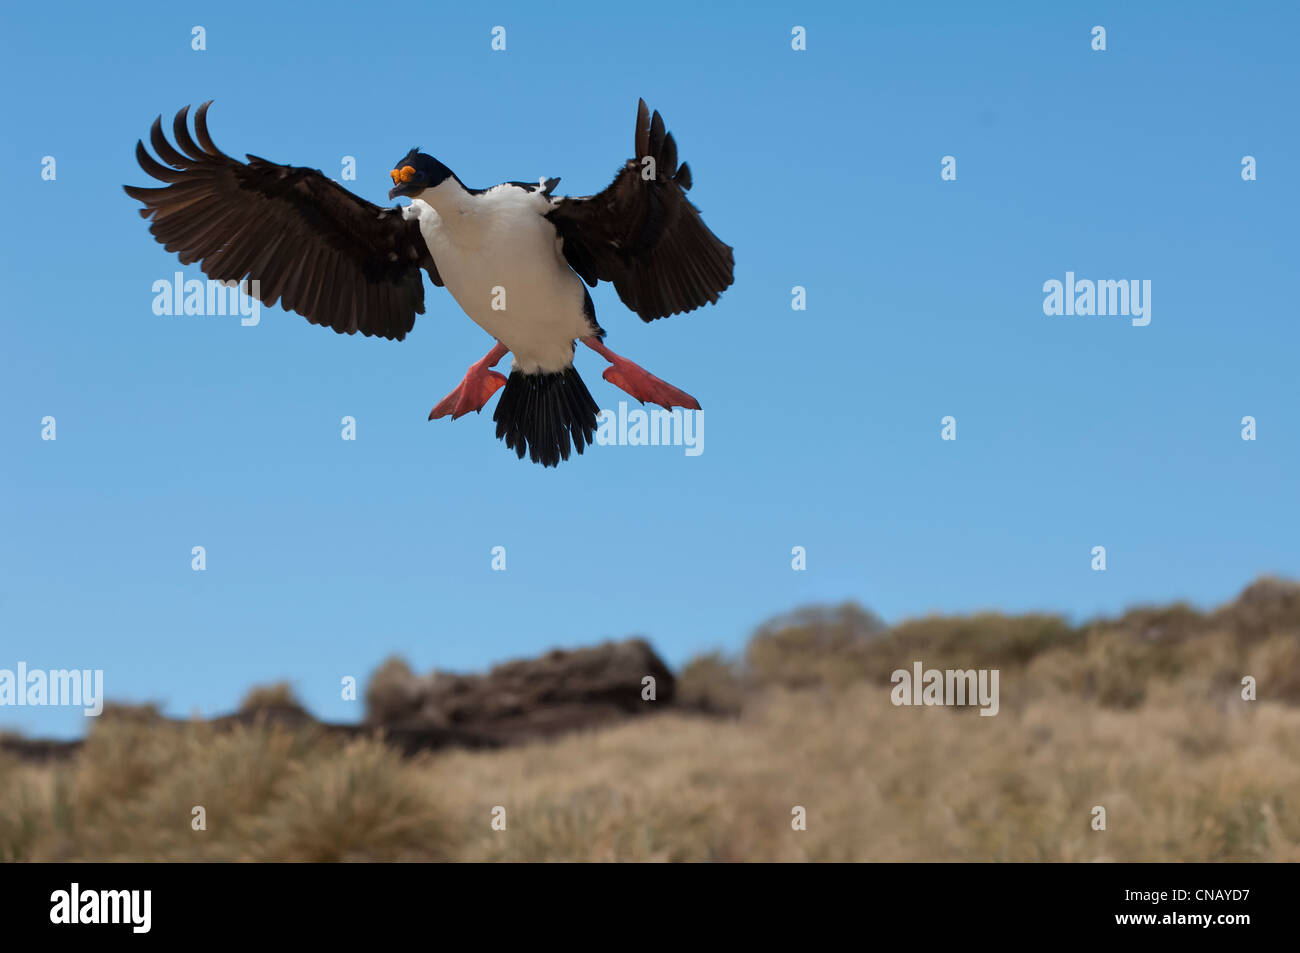 Imperial Shag, formerly Blue-eyed or King Cormorant, (Phalacrocorax atriceps) in flight, New Island, Falkland Islands - Stock Image